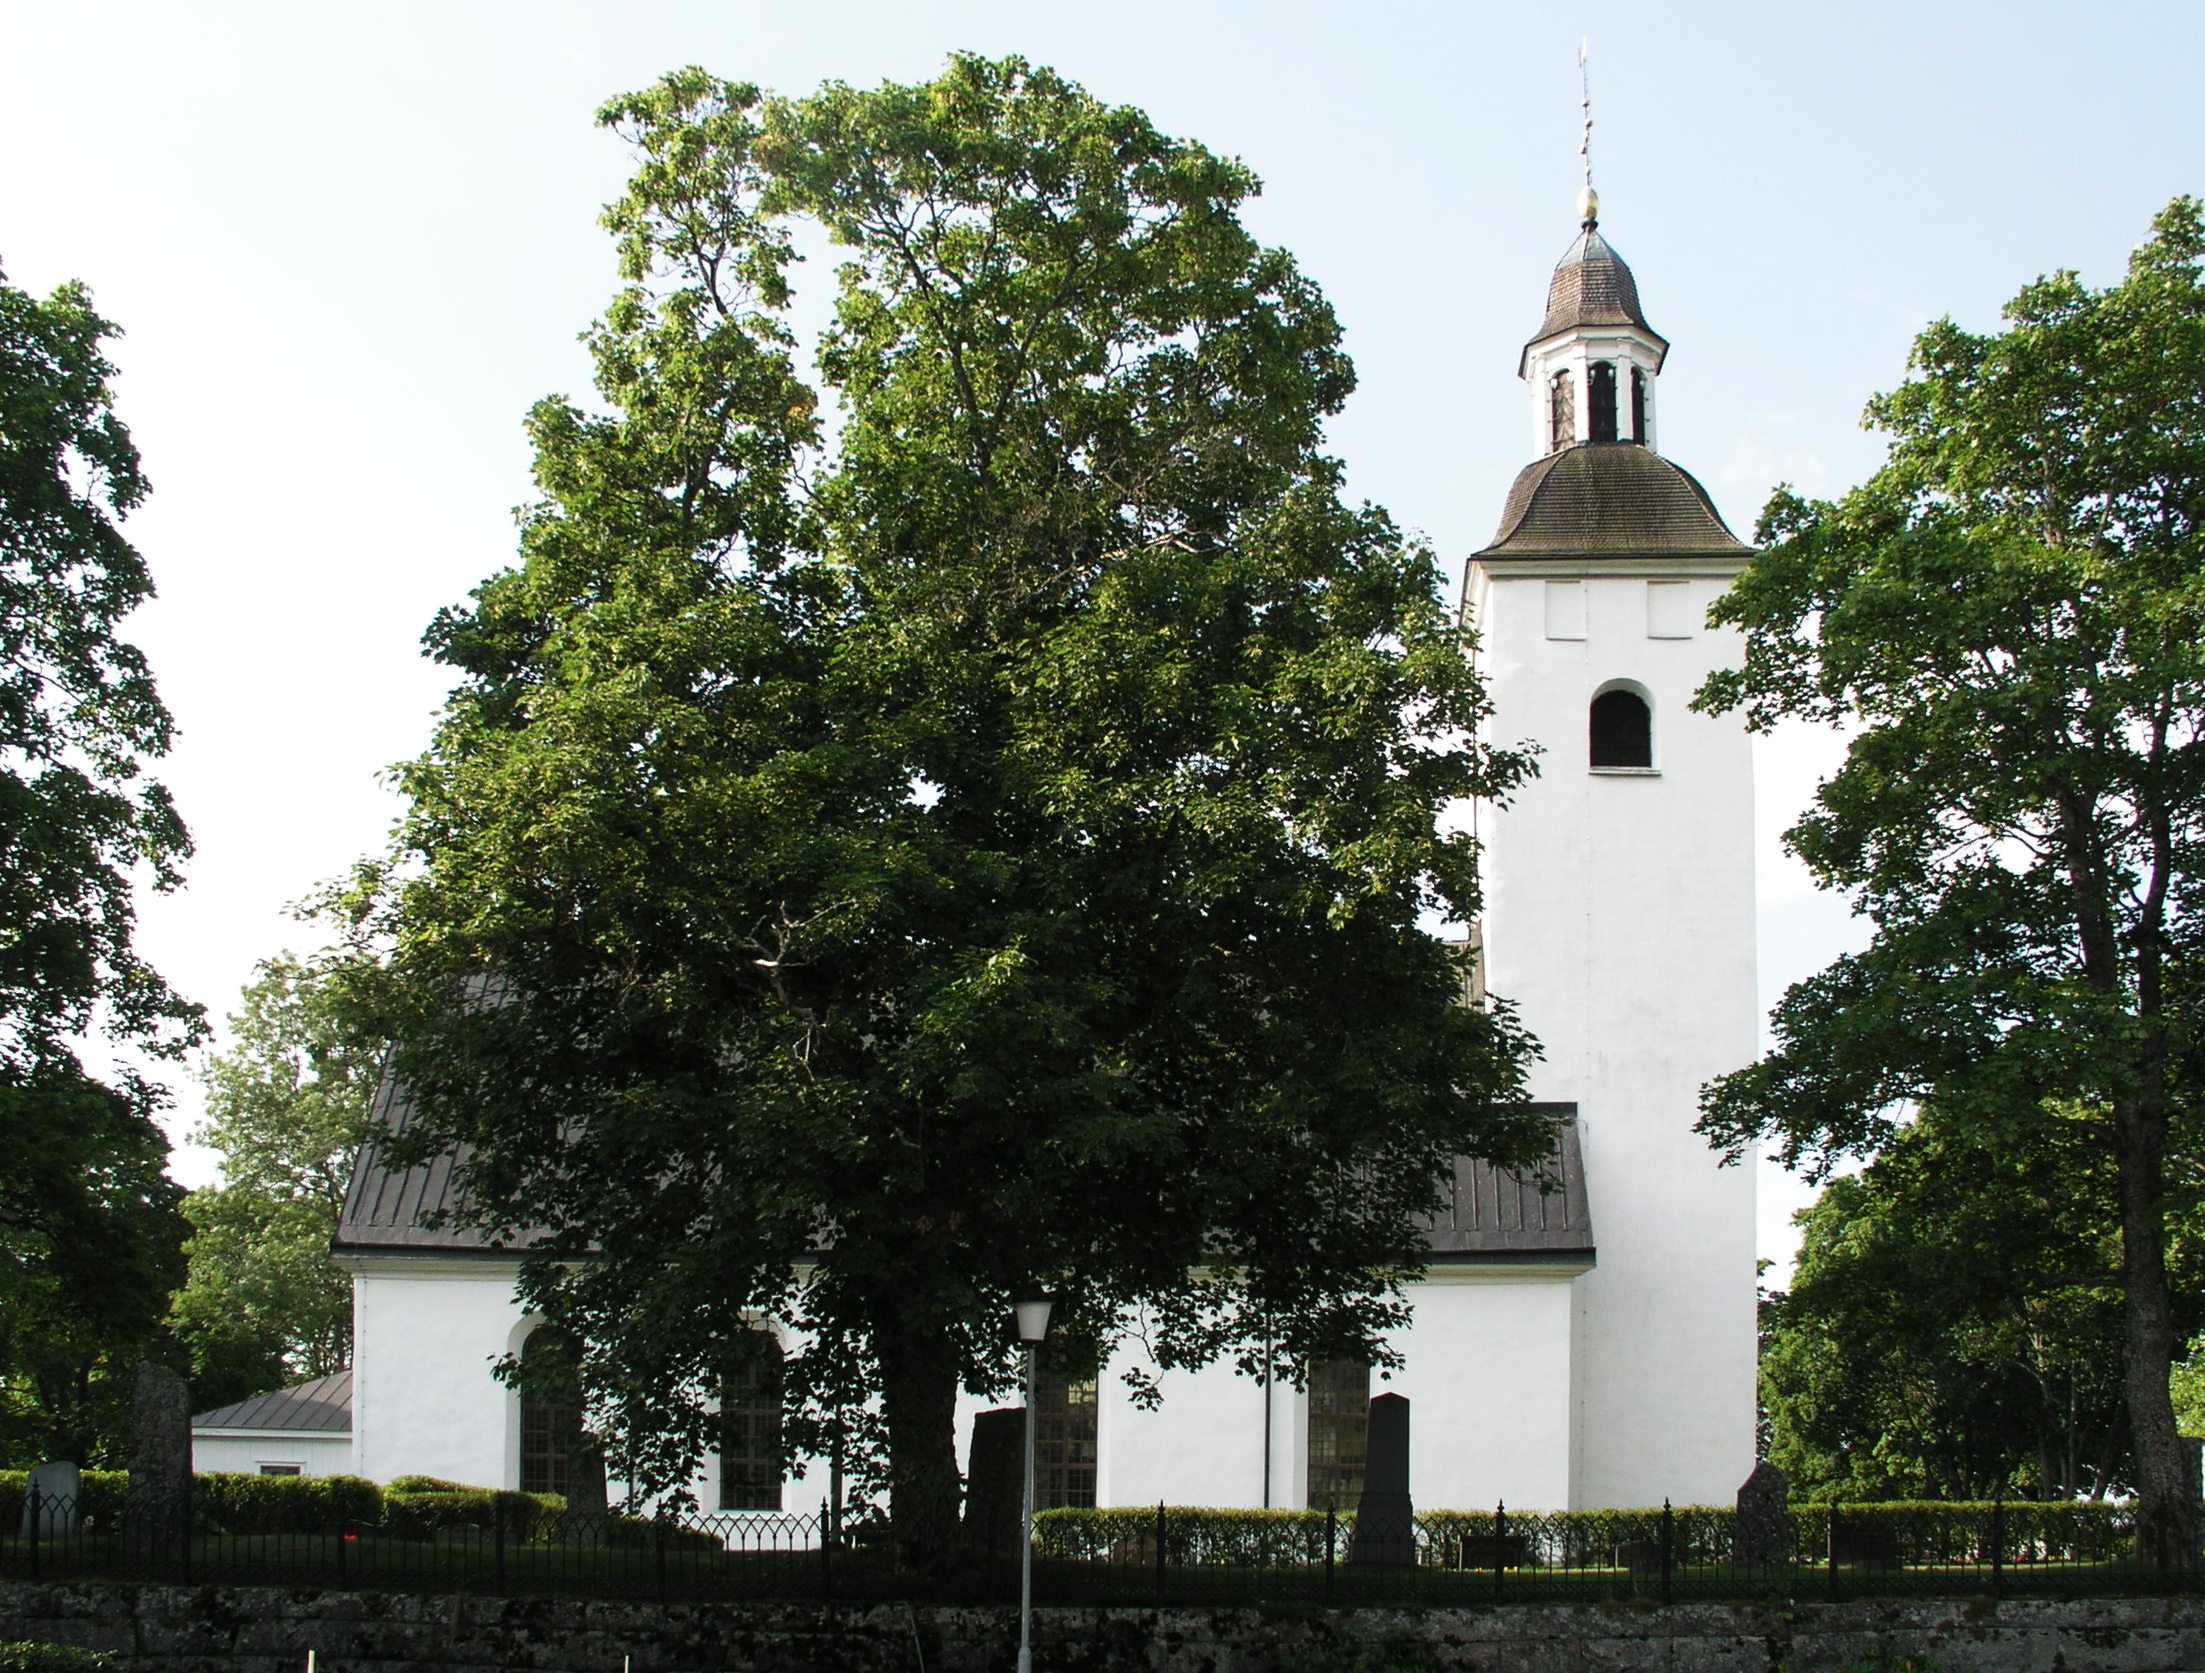 Hlsingtuna kyrka. - Lnsmuseet Gvleborg / DigitaltMuseum